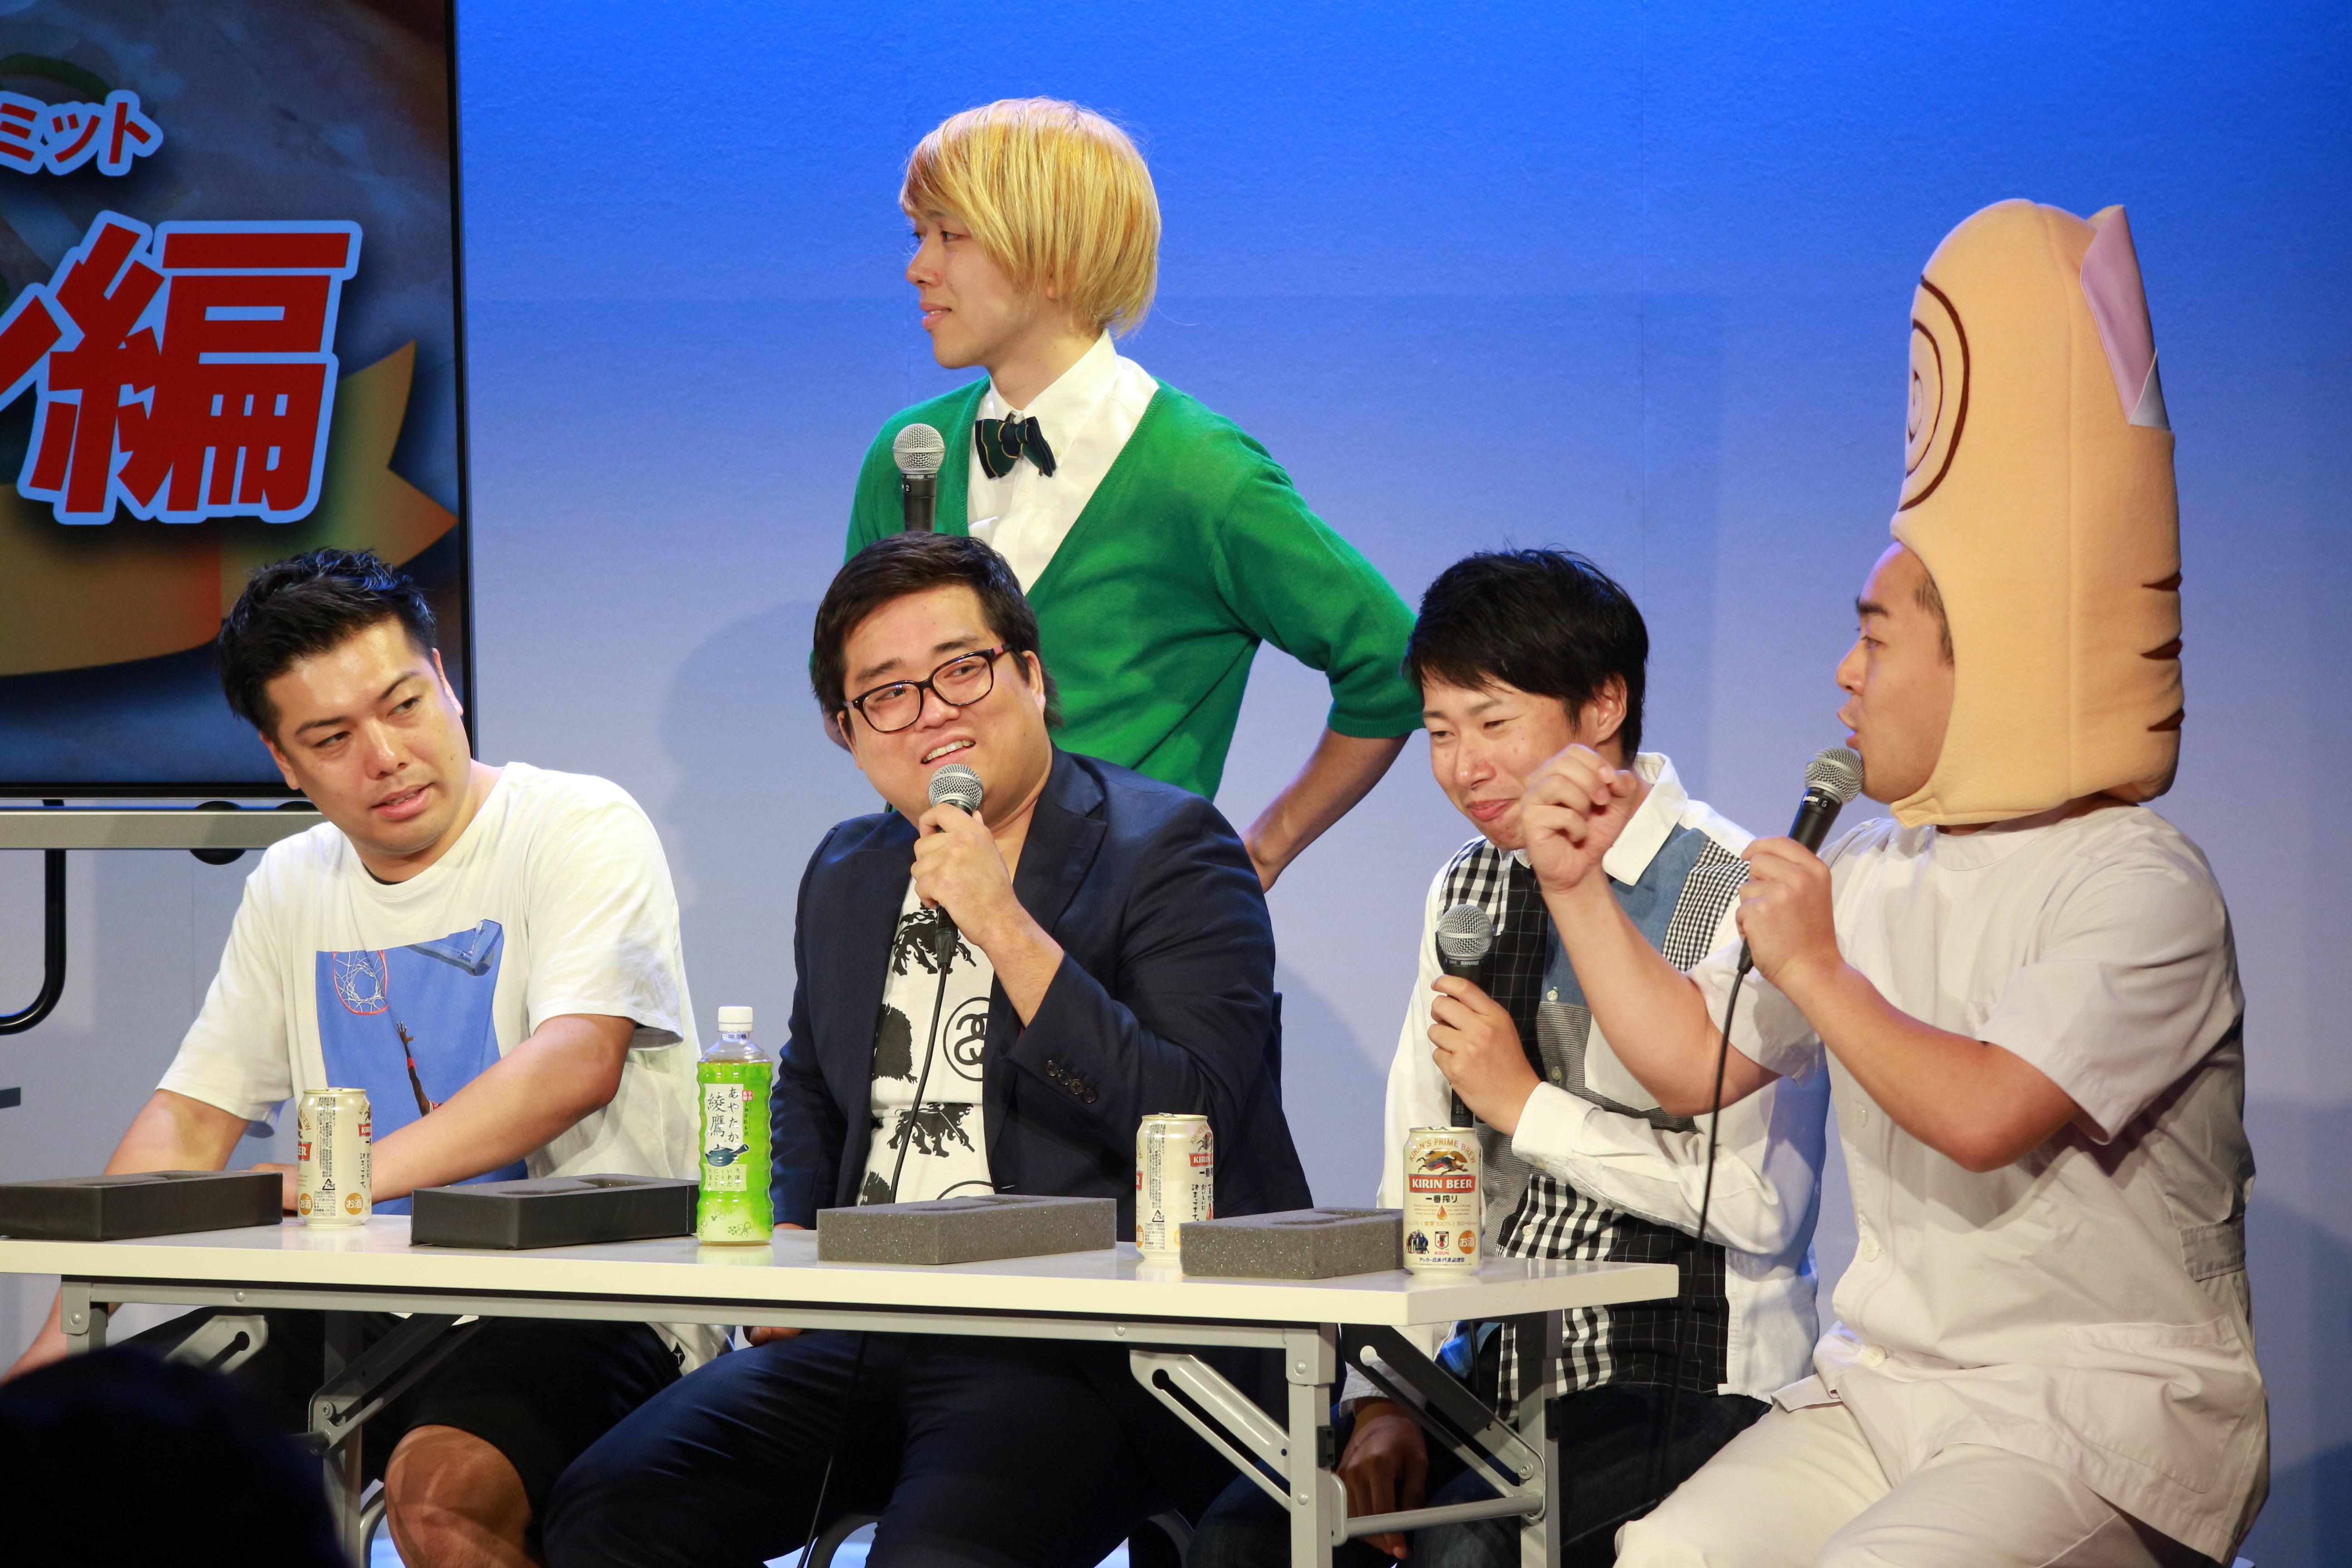 http://news.yoshimoto.co.jp/20180630023656-7e3fec4ad08a43864feac3ed2e9ff23420cdc226.jpg